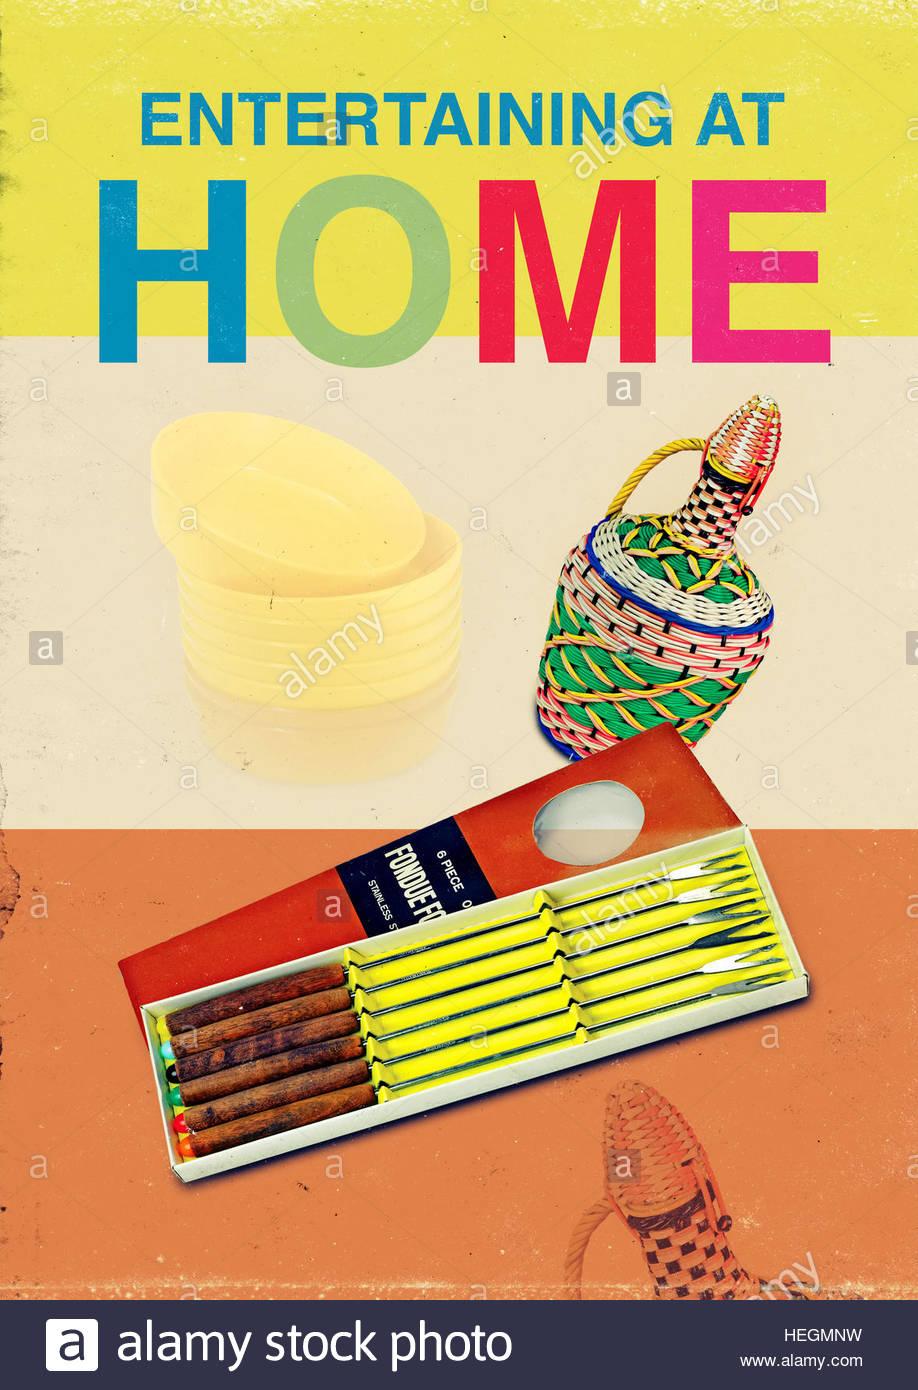 Entertaining home mid century retro kitsch vintage lifestyle - Stock Image